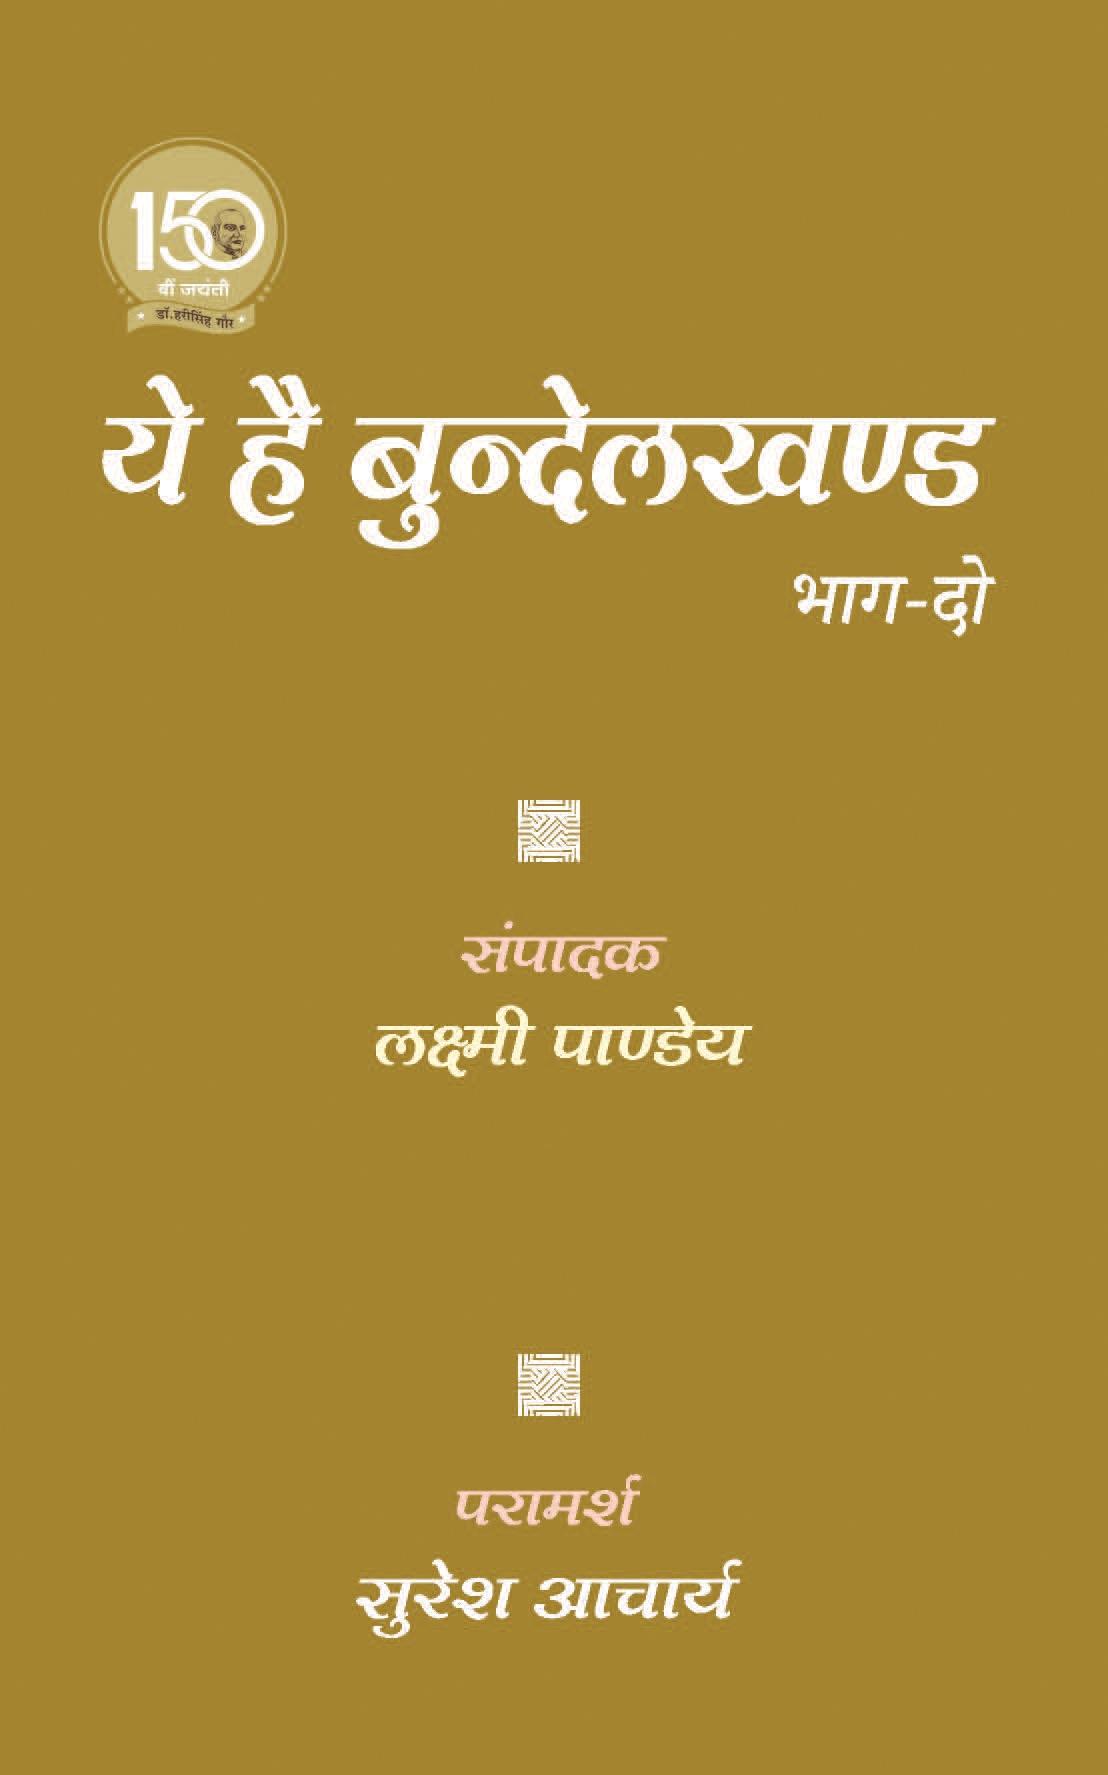 Ye Hai Bundelkhand — Vol-2<br>ये है बुन्देलखण्ड—खण्ड-2